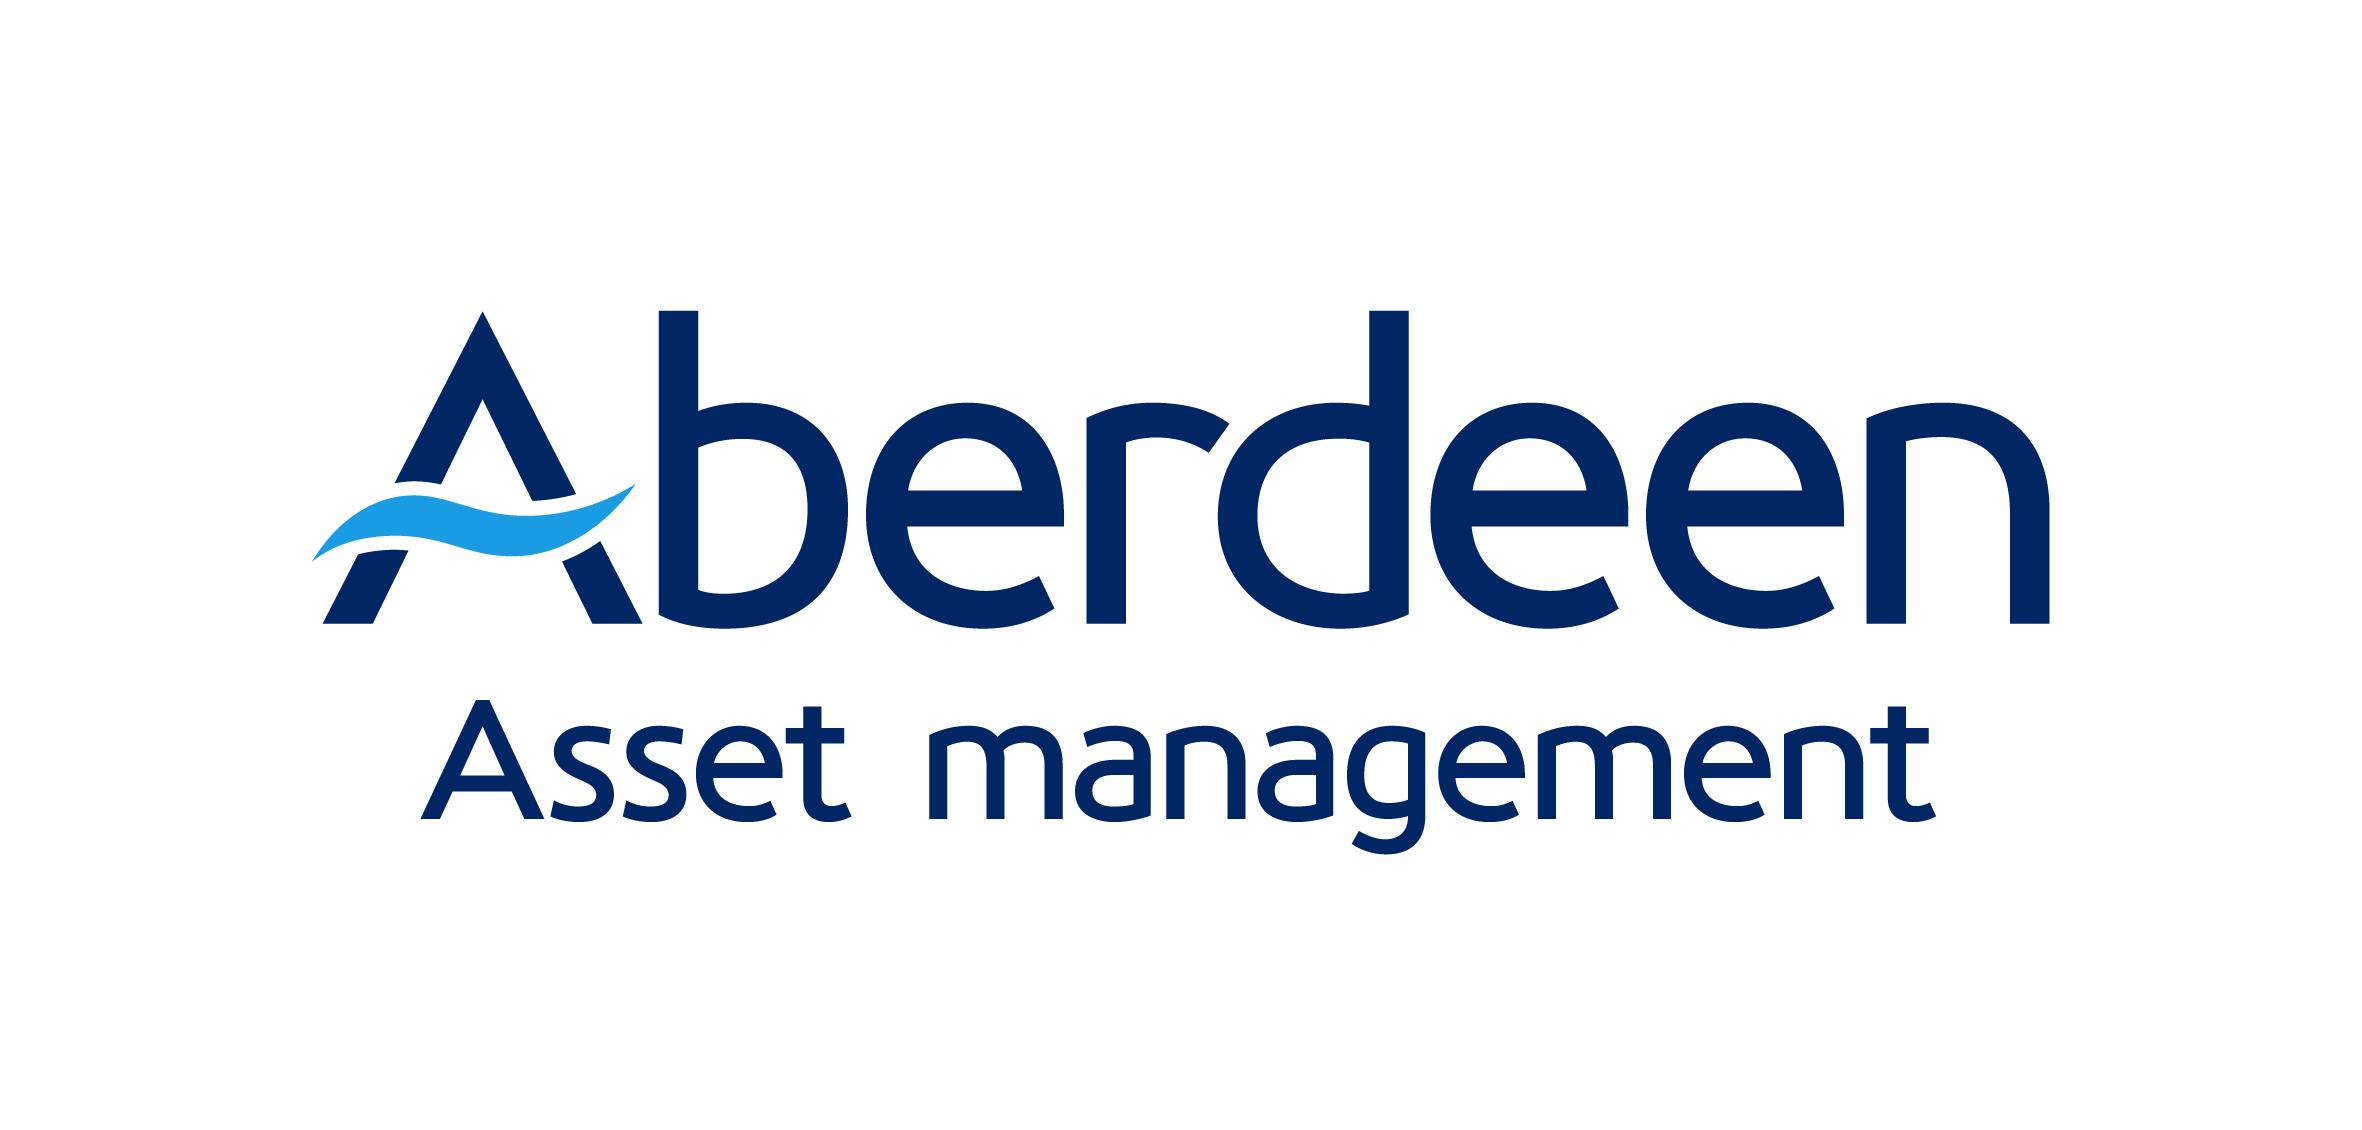 Invertir en acciones de Aberdeen Asset Mgmt